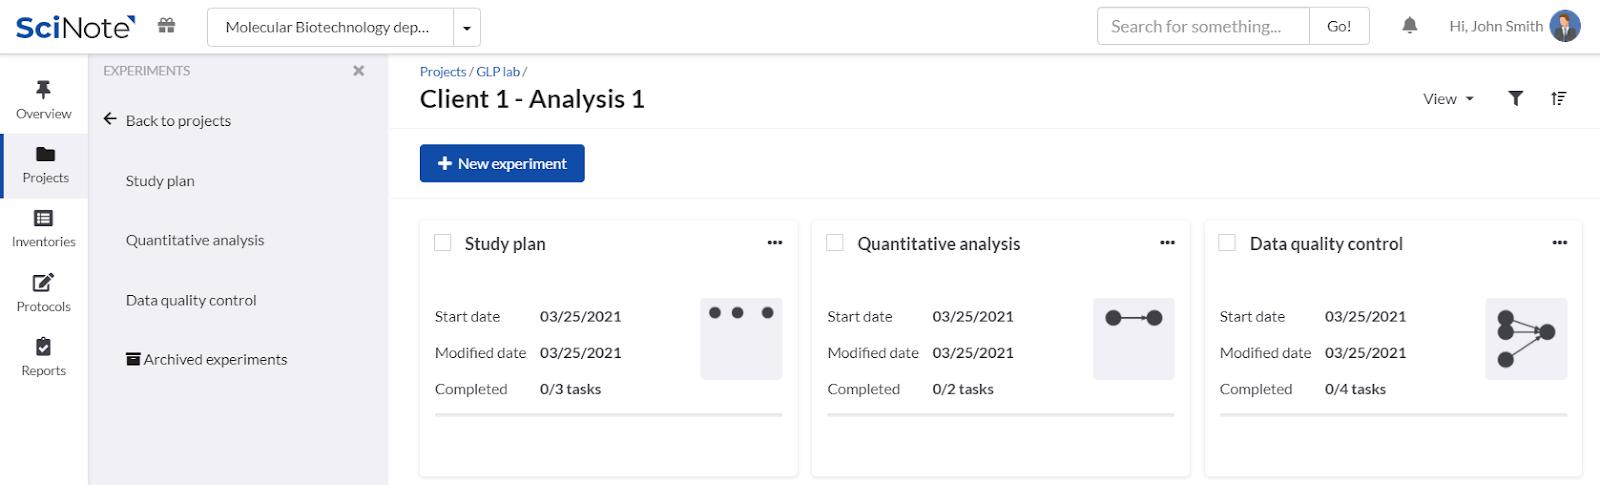 Client 1 Analysis 1